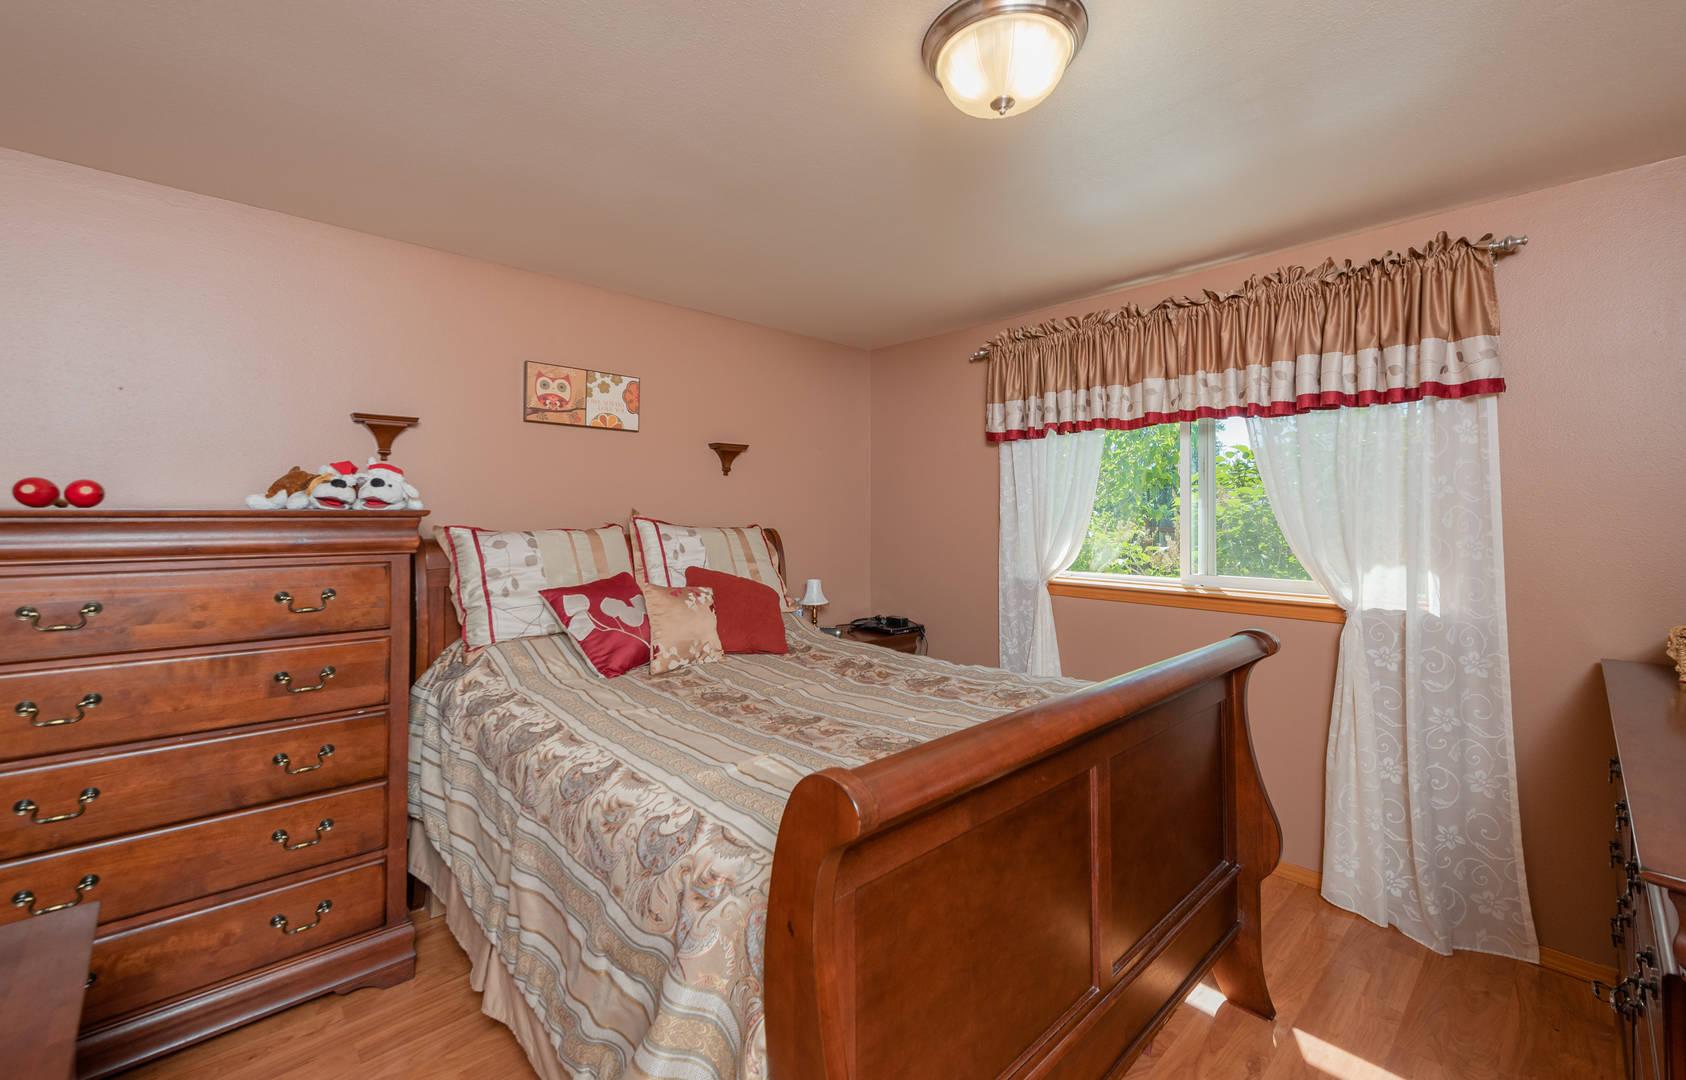 6481 Portal Manor Dr, Ferndale, WA 98248